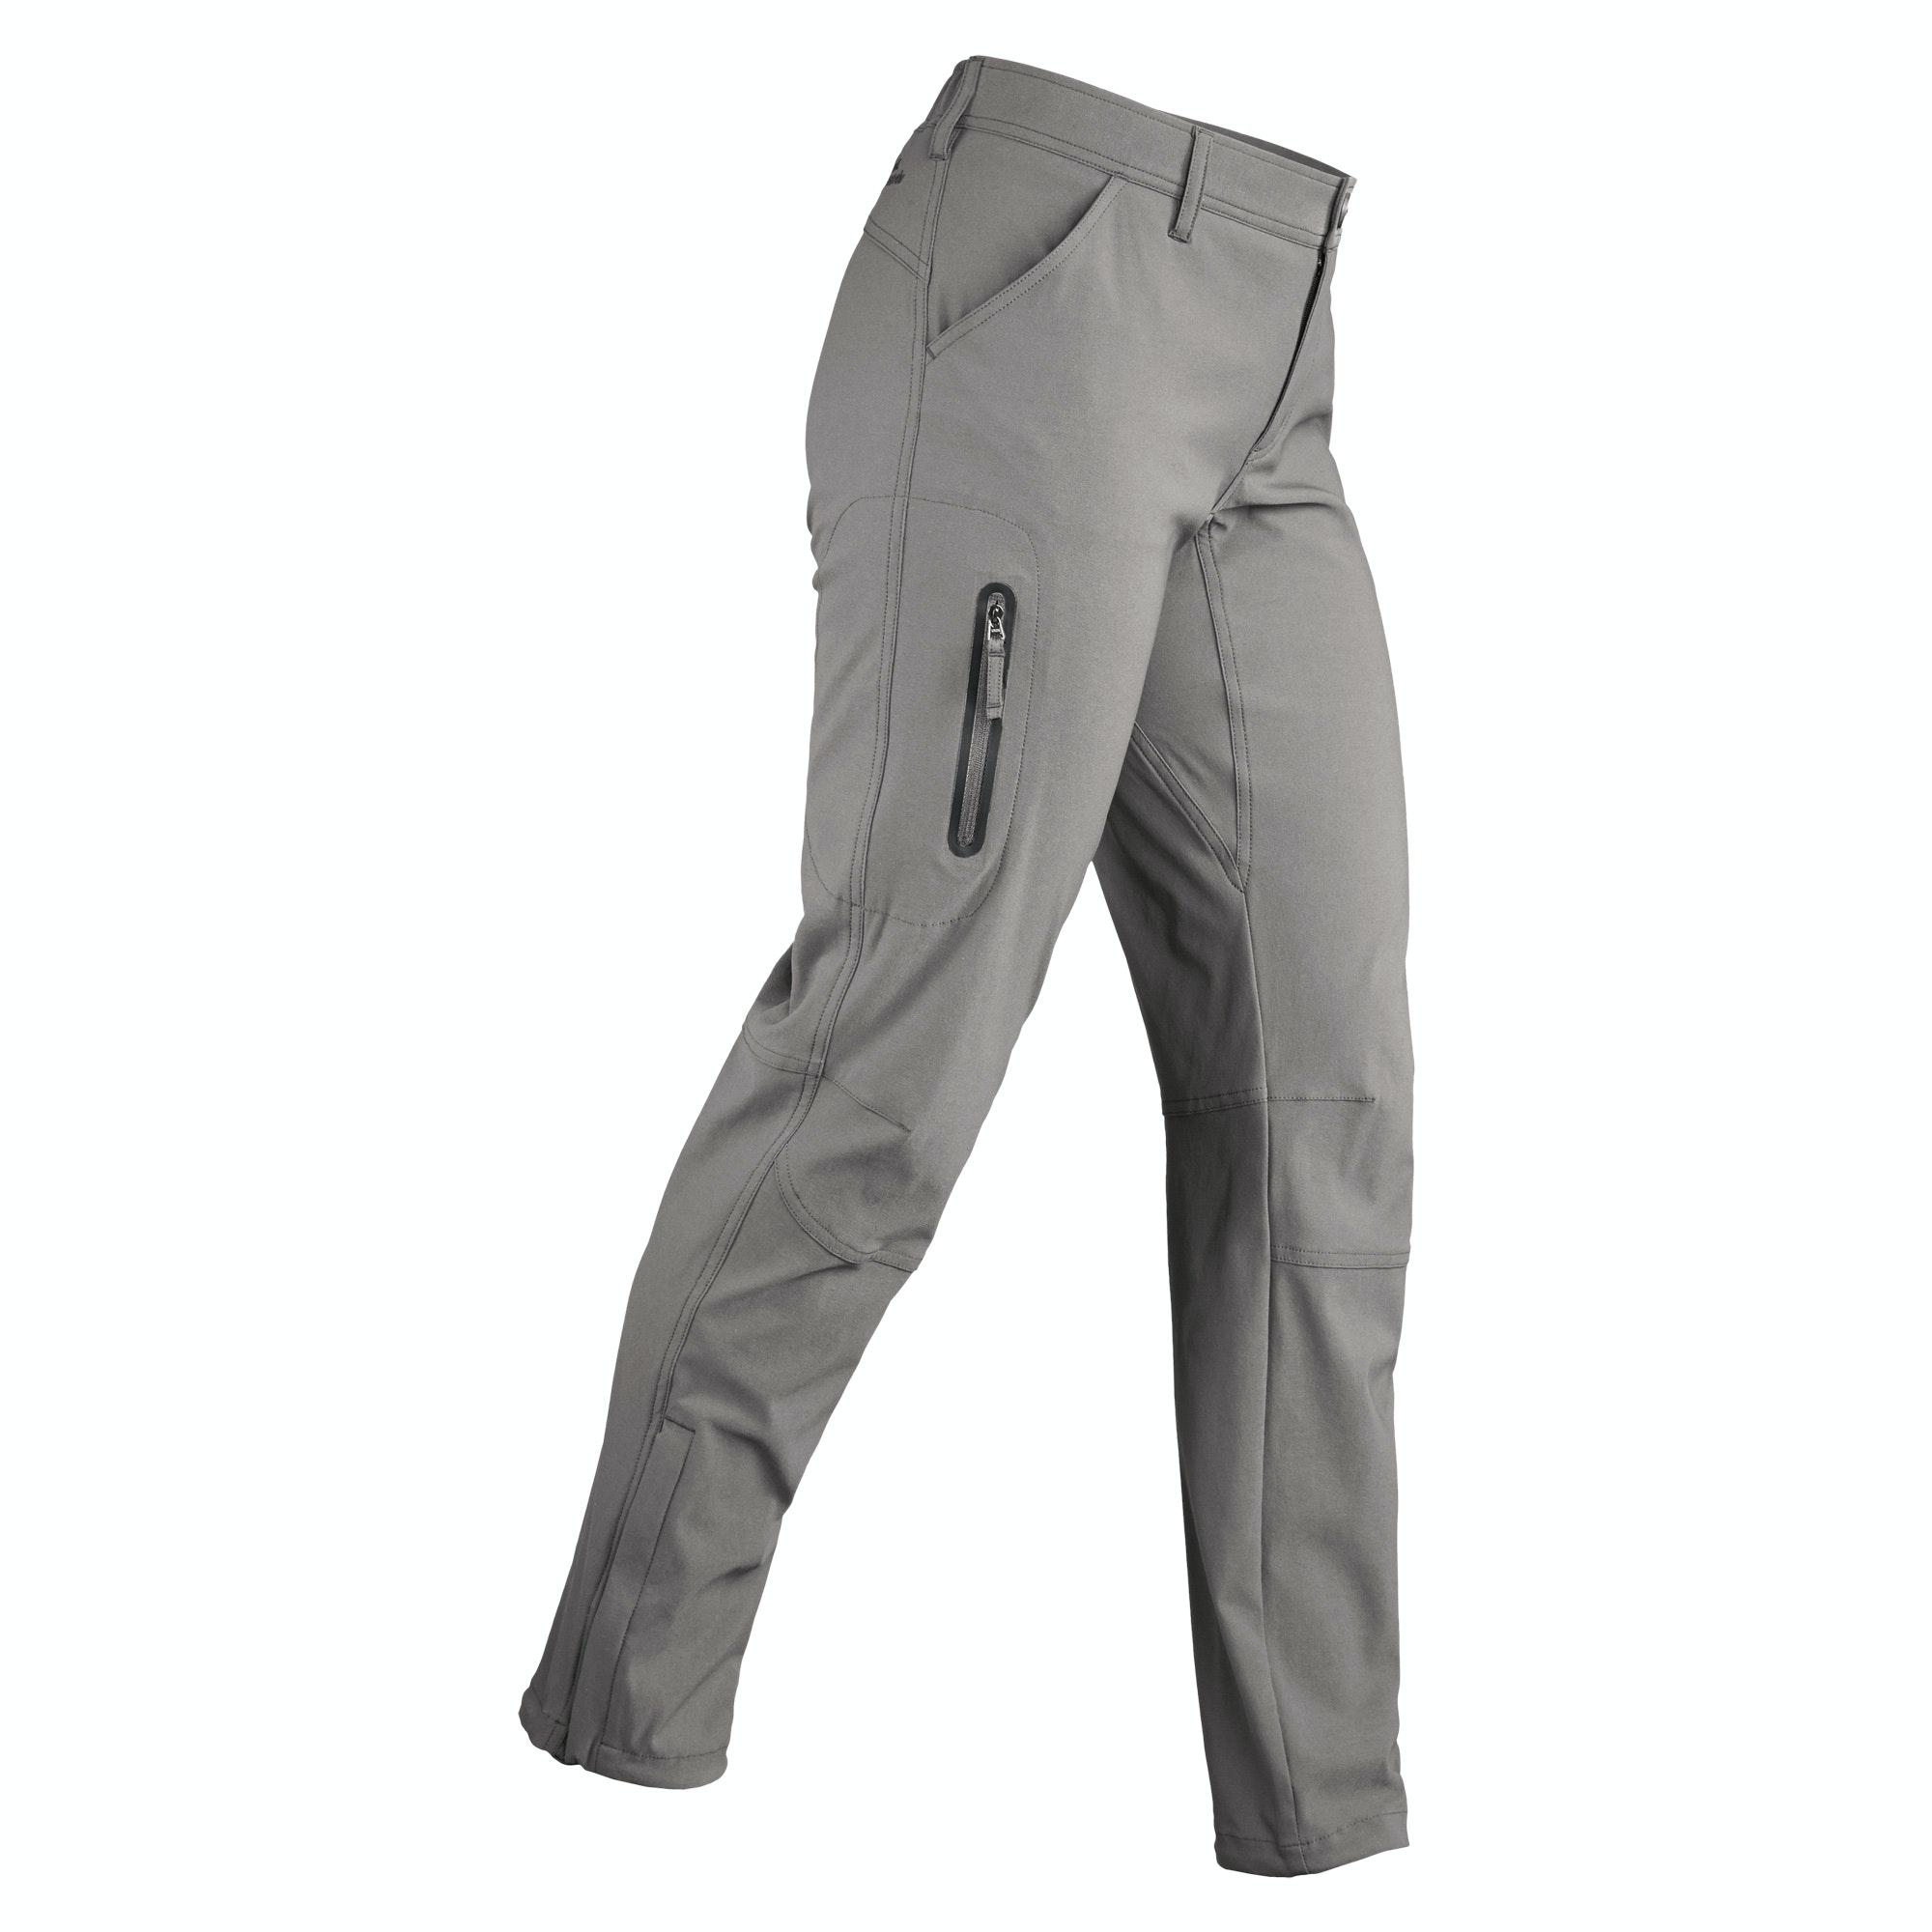 NEW-Kathmandu-Eris-Women-039-s-Softshell-Hiking-Pants-Trousers-v2-Zip-Hem-Over-Boots thumbnail 13